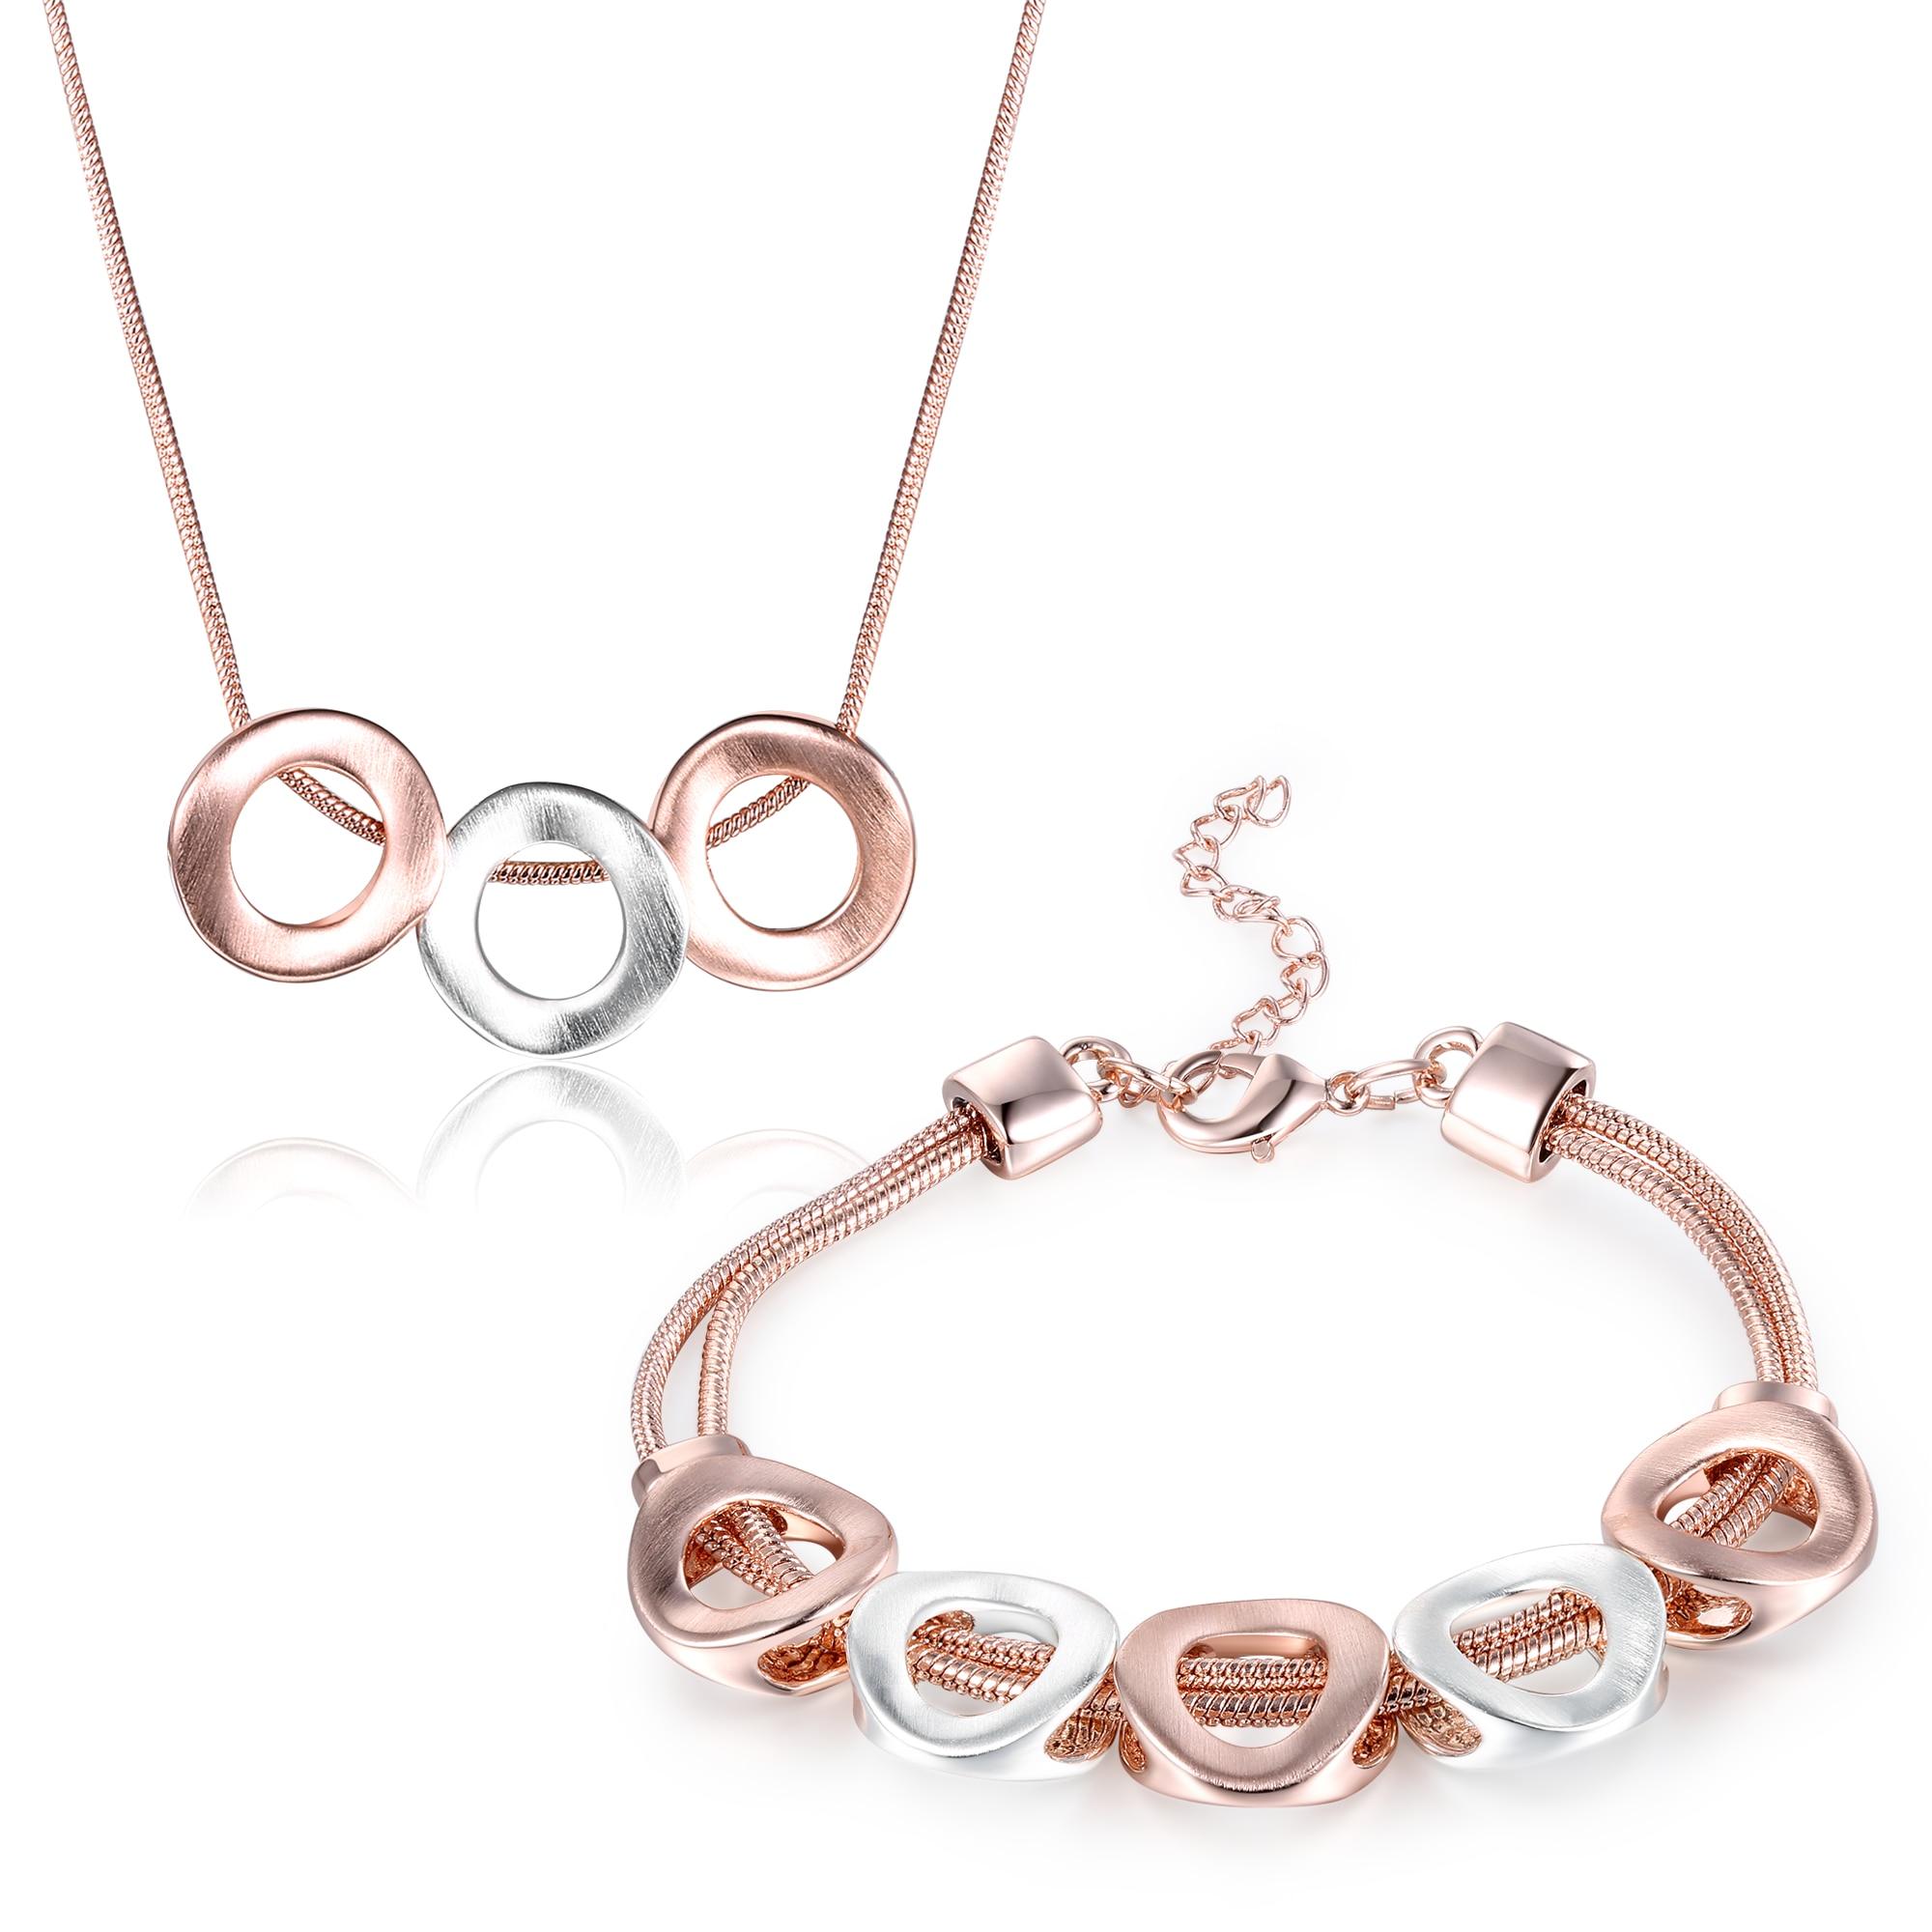 6186943f52cf ROXI Rose Gold Silver Round Circle Jewelry Set para mujer moda Rose Gold  cadena collar pulsera multicapa conjuntos de joyería - a.williamcho.me